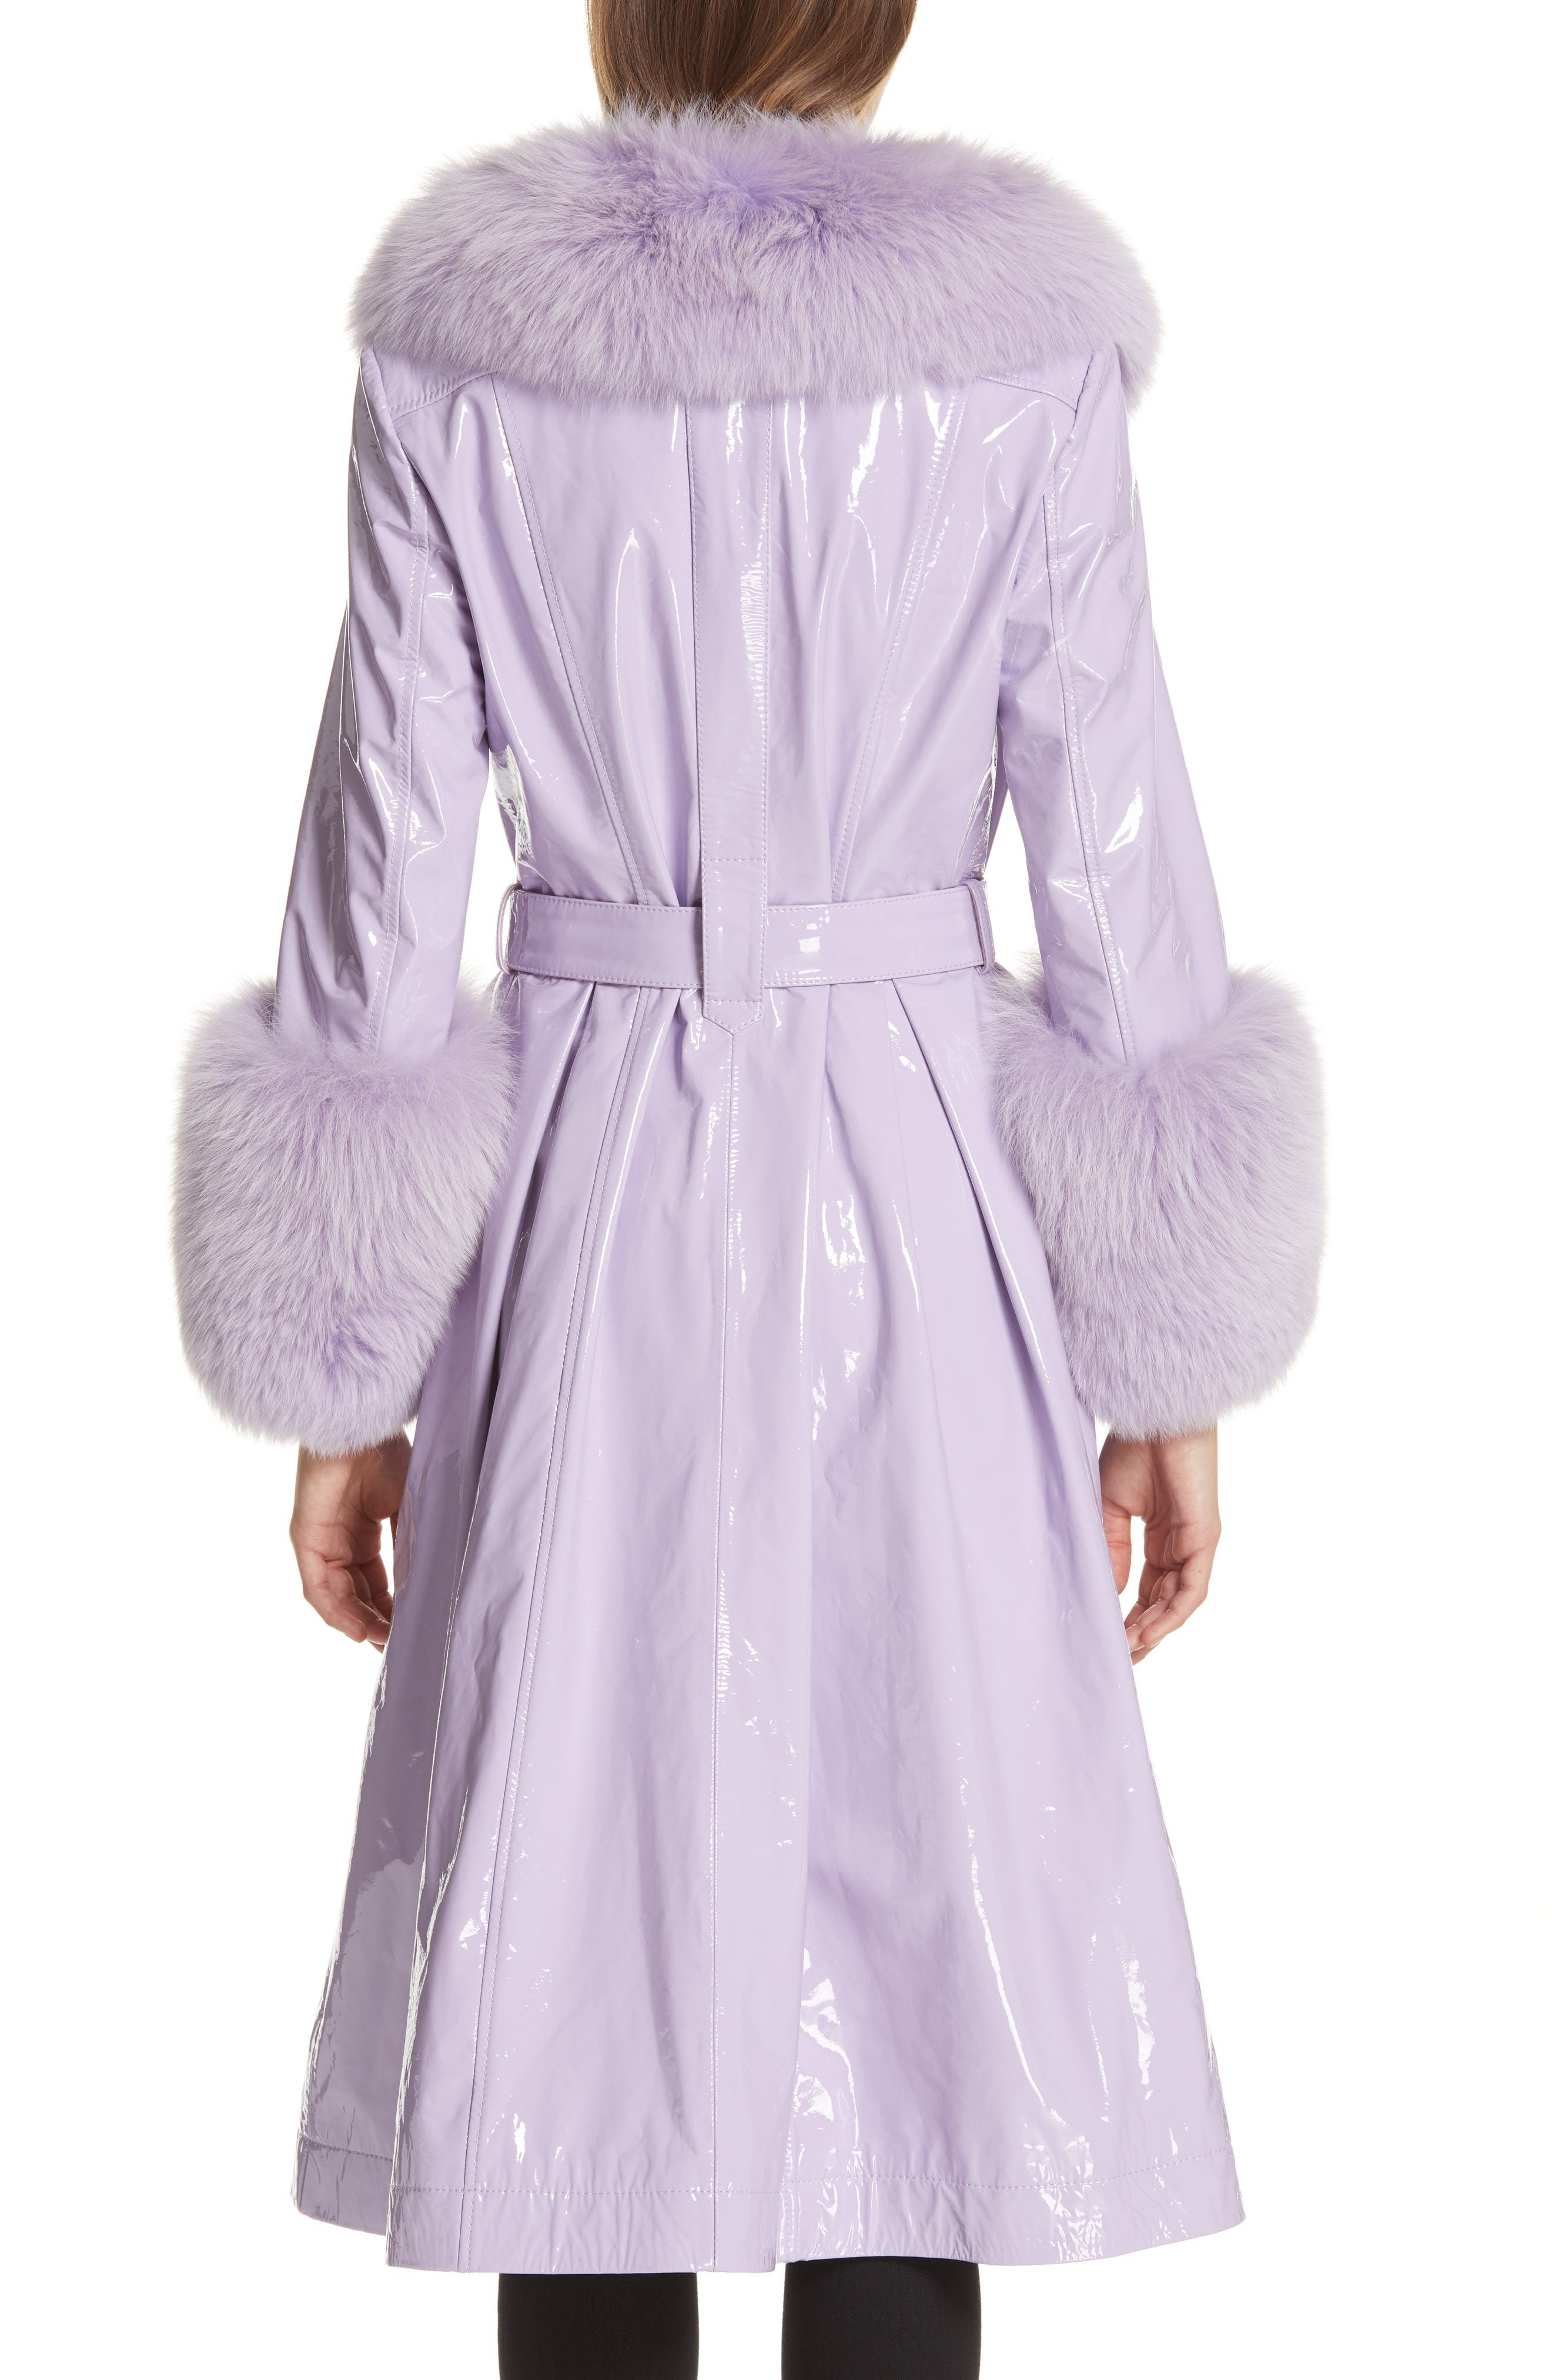 SAKS POTTS, Patent Leather Coat with Genuine Fox Fur Trim, Alternate thumbnail 2, color, LAVENDER